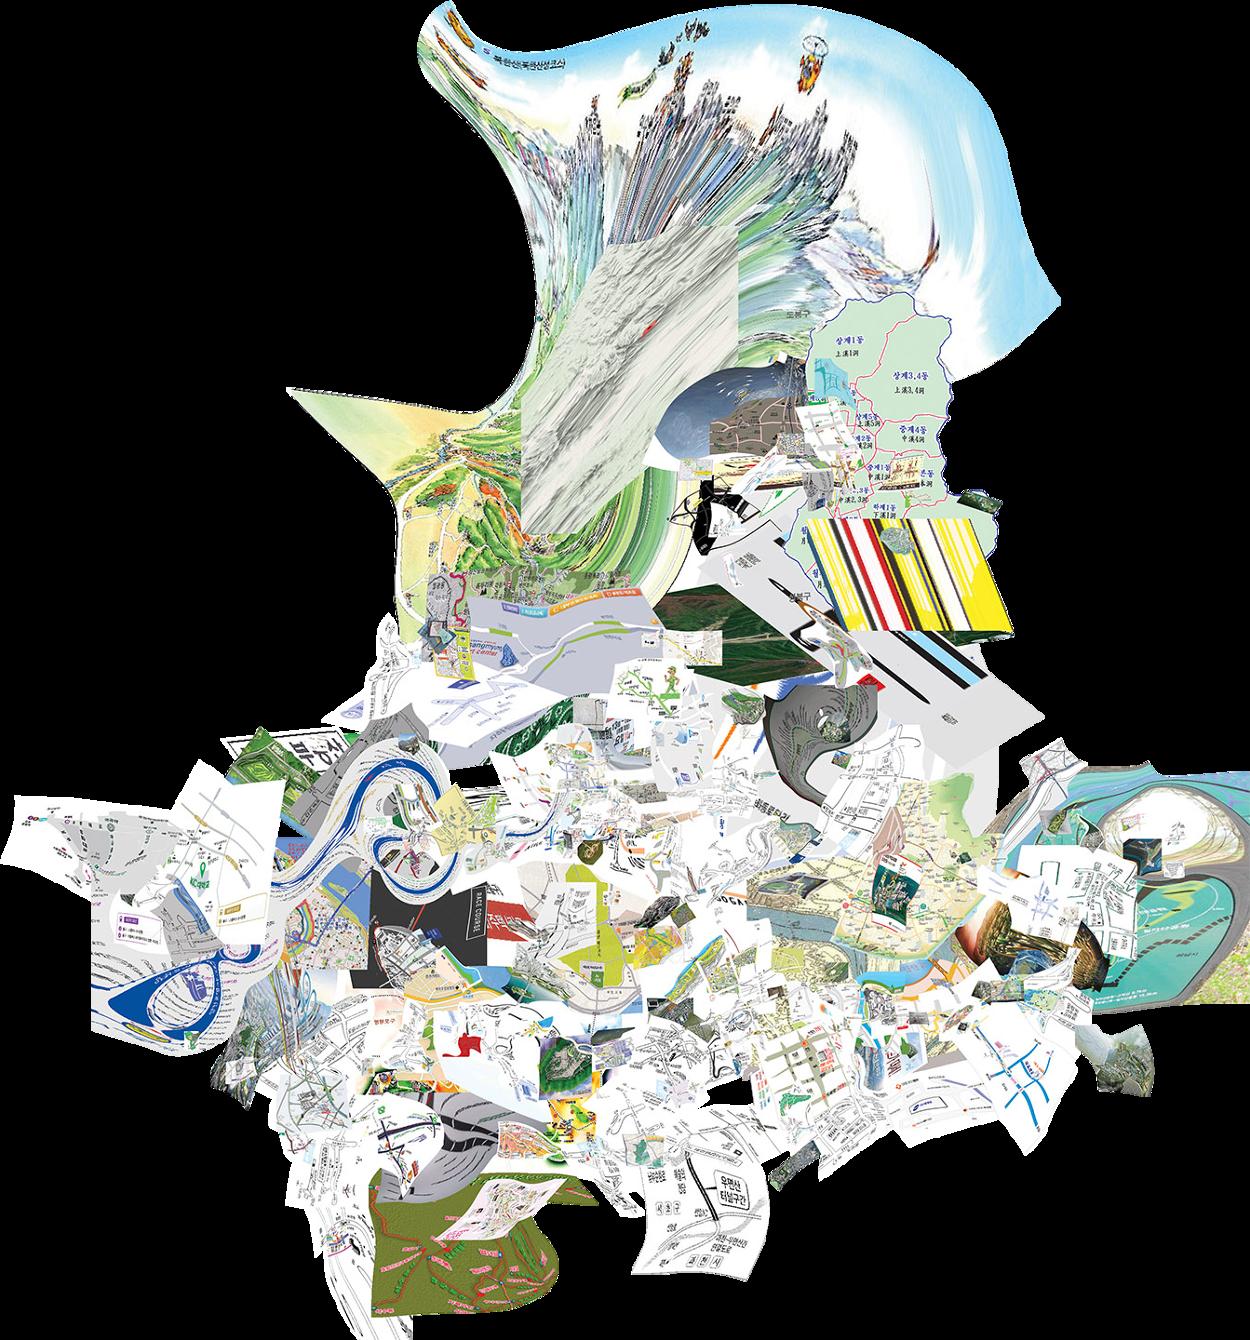 Uninformation Mapping & Video - Minkee Bae